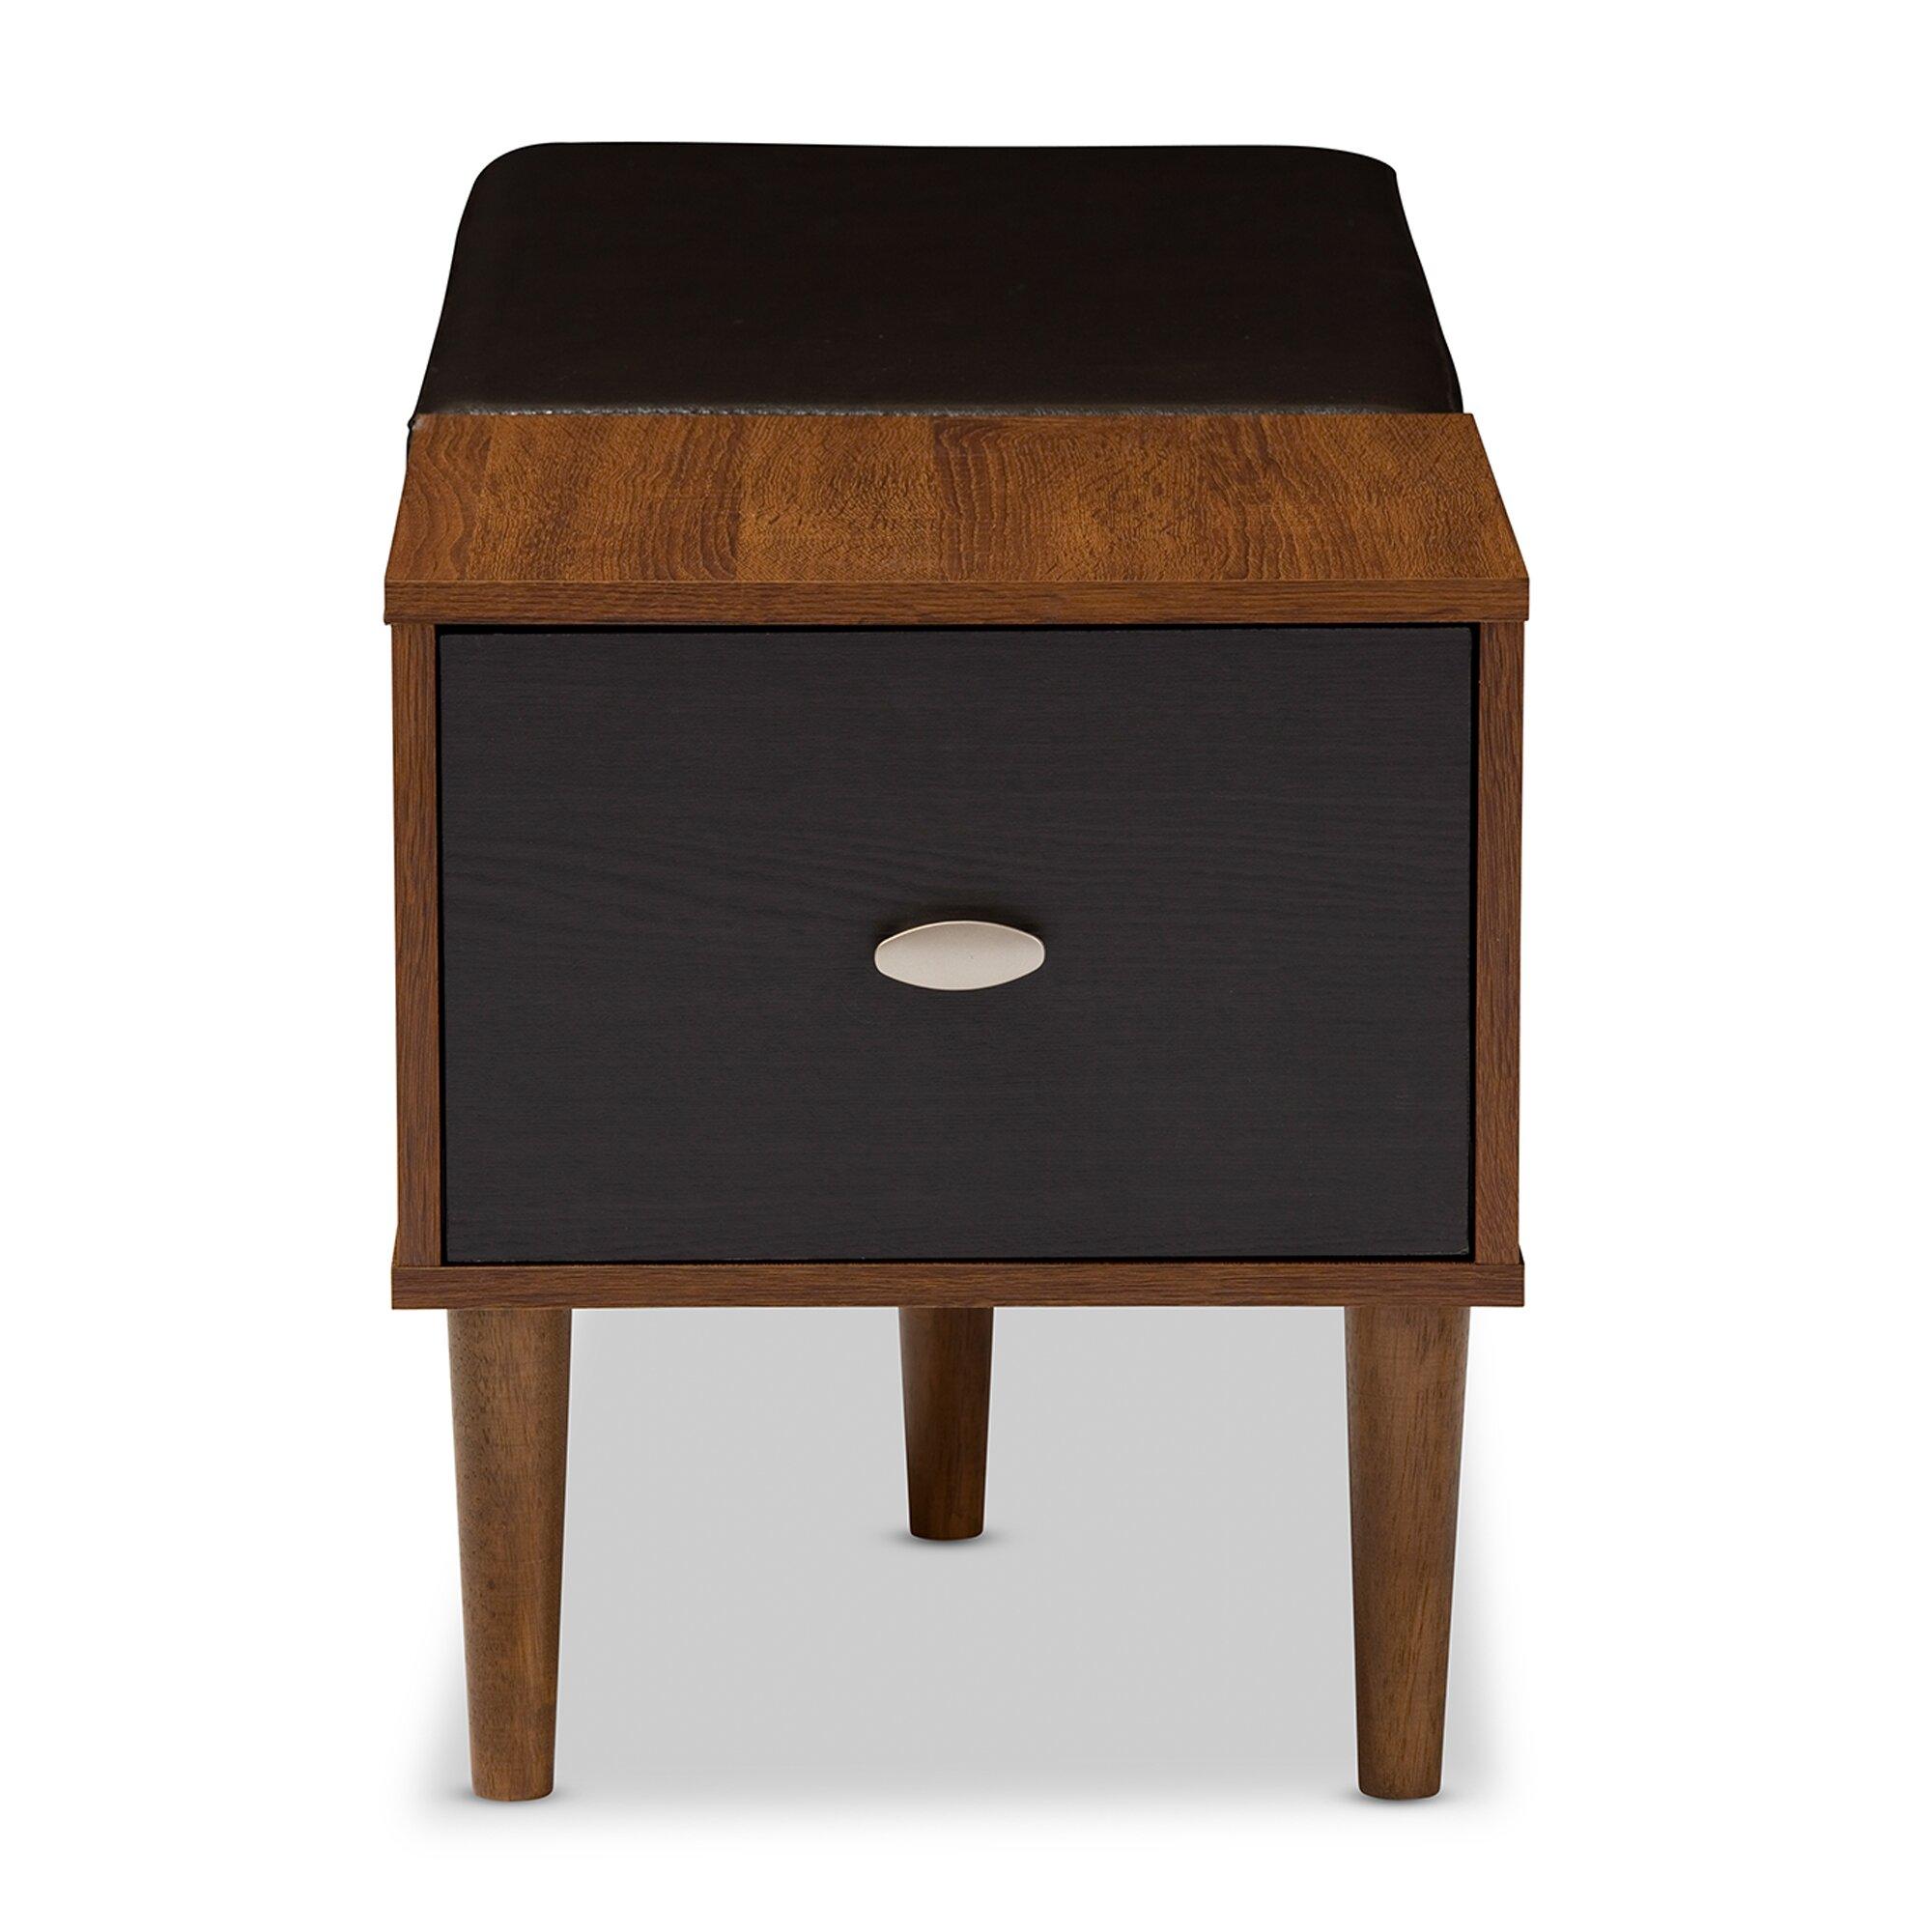 Wholesale interiors merrick wood storage entryway bench amp reviews